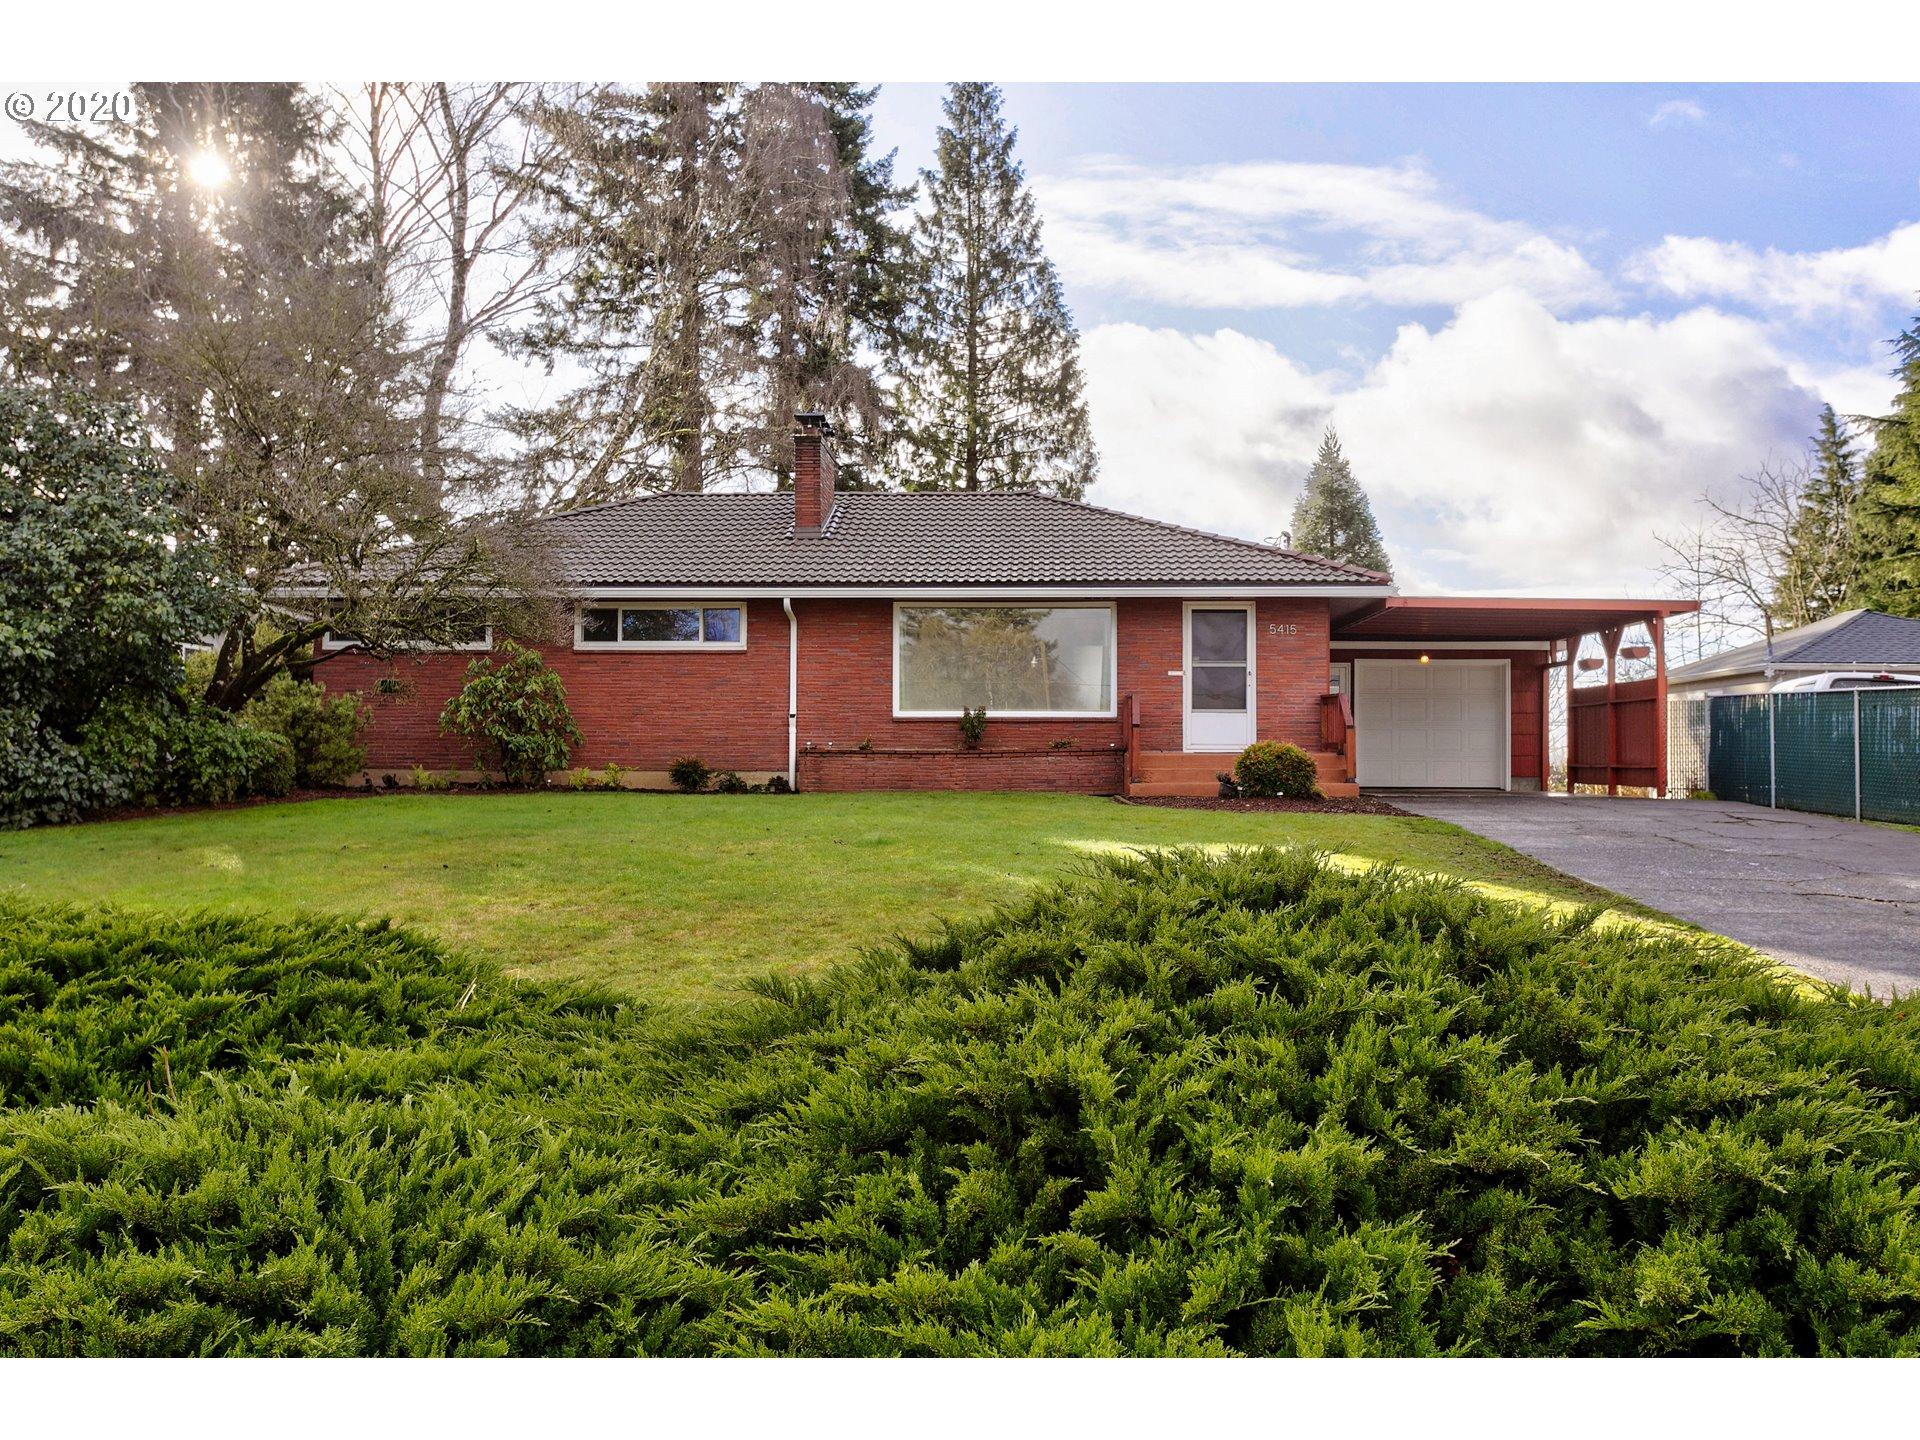 5415 NE 47th St, Vancouver, WA 98661